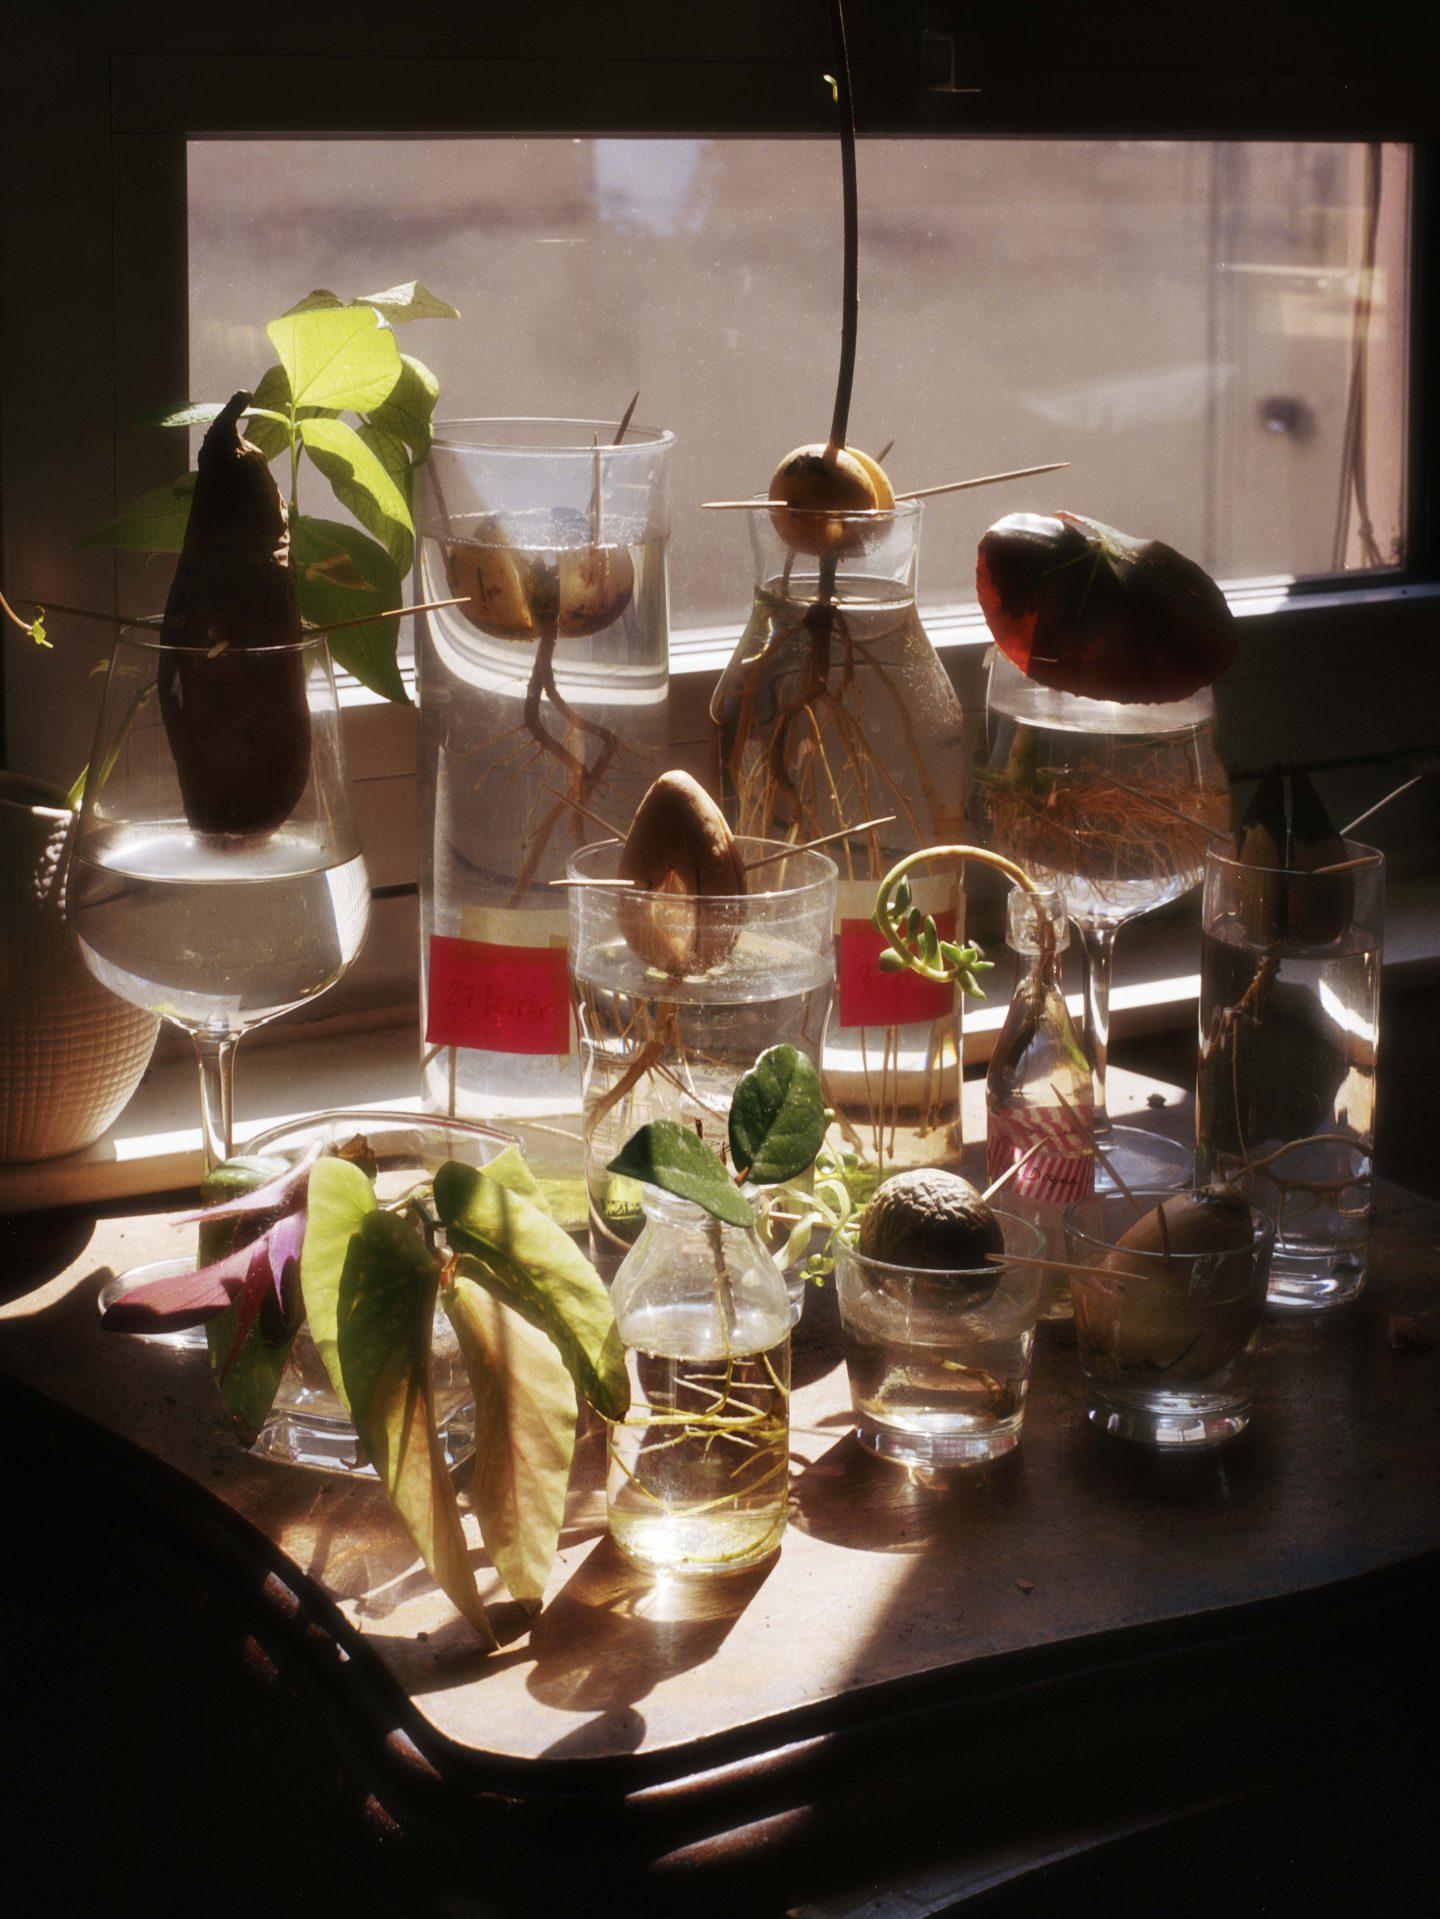 IGNANT-Photography-Jacques-Brun-Sunset-Garden-017